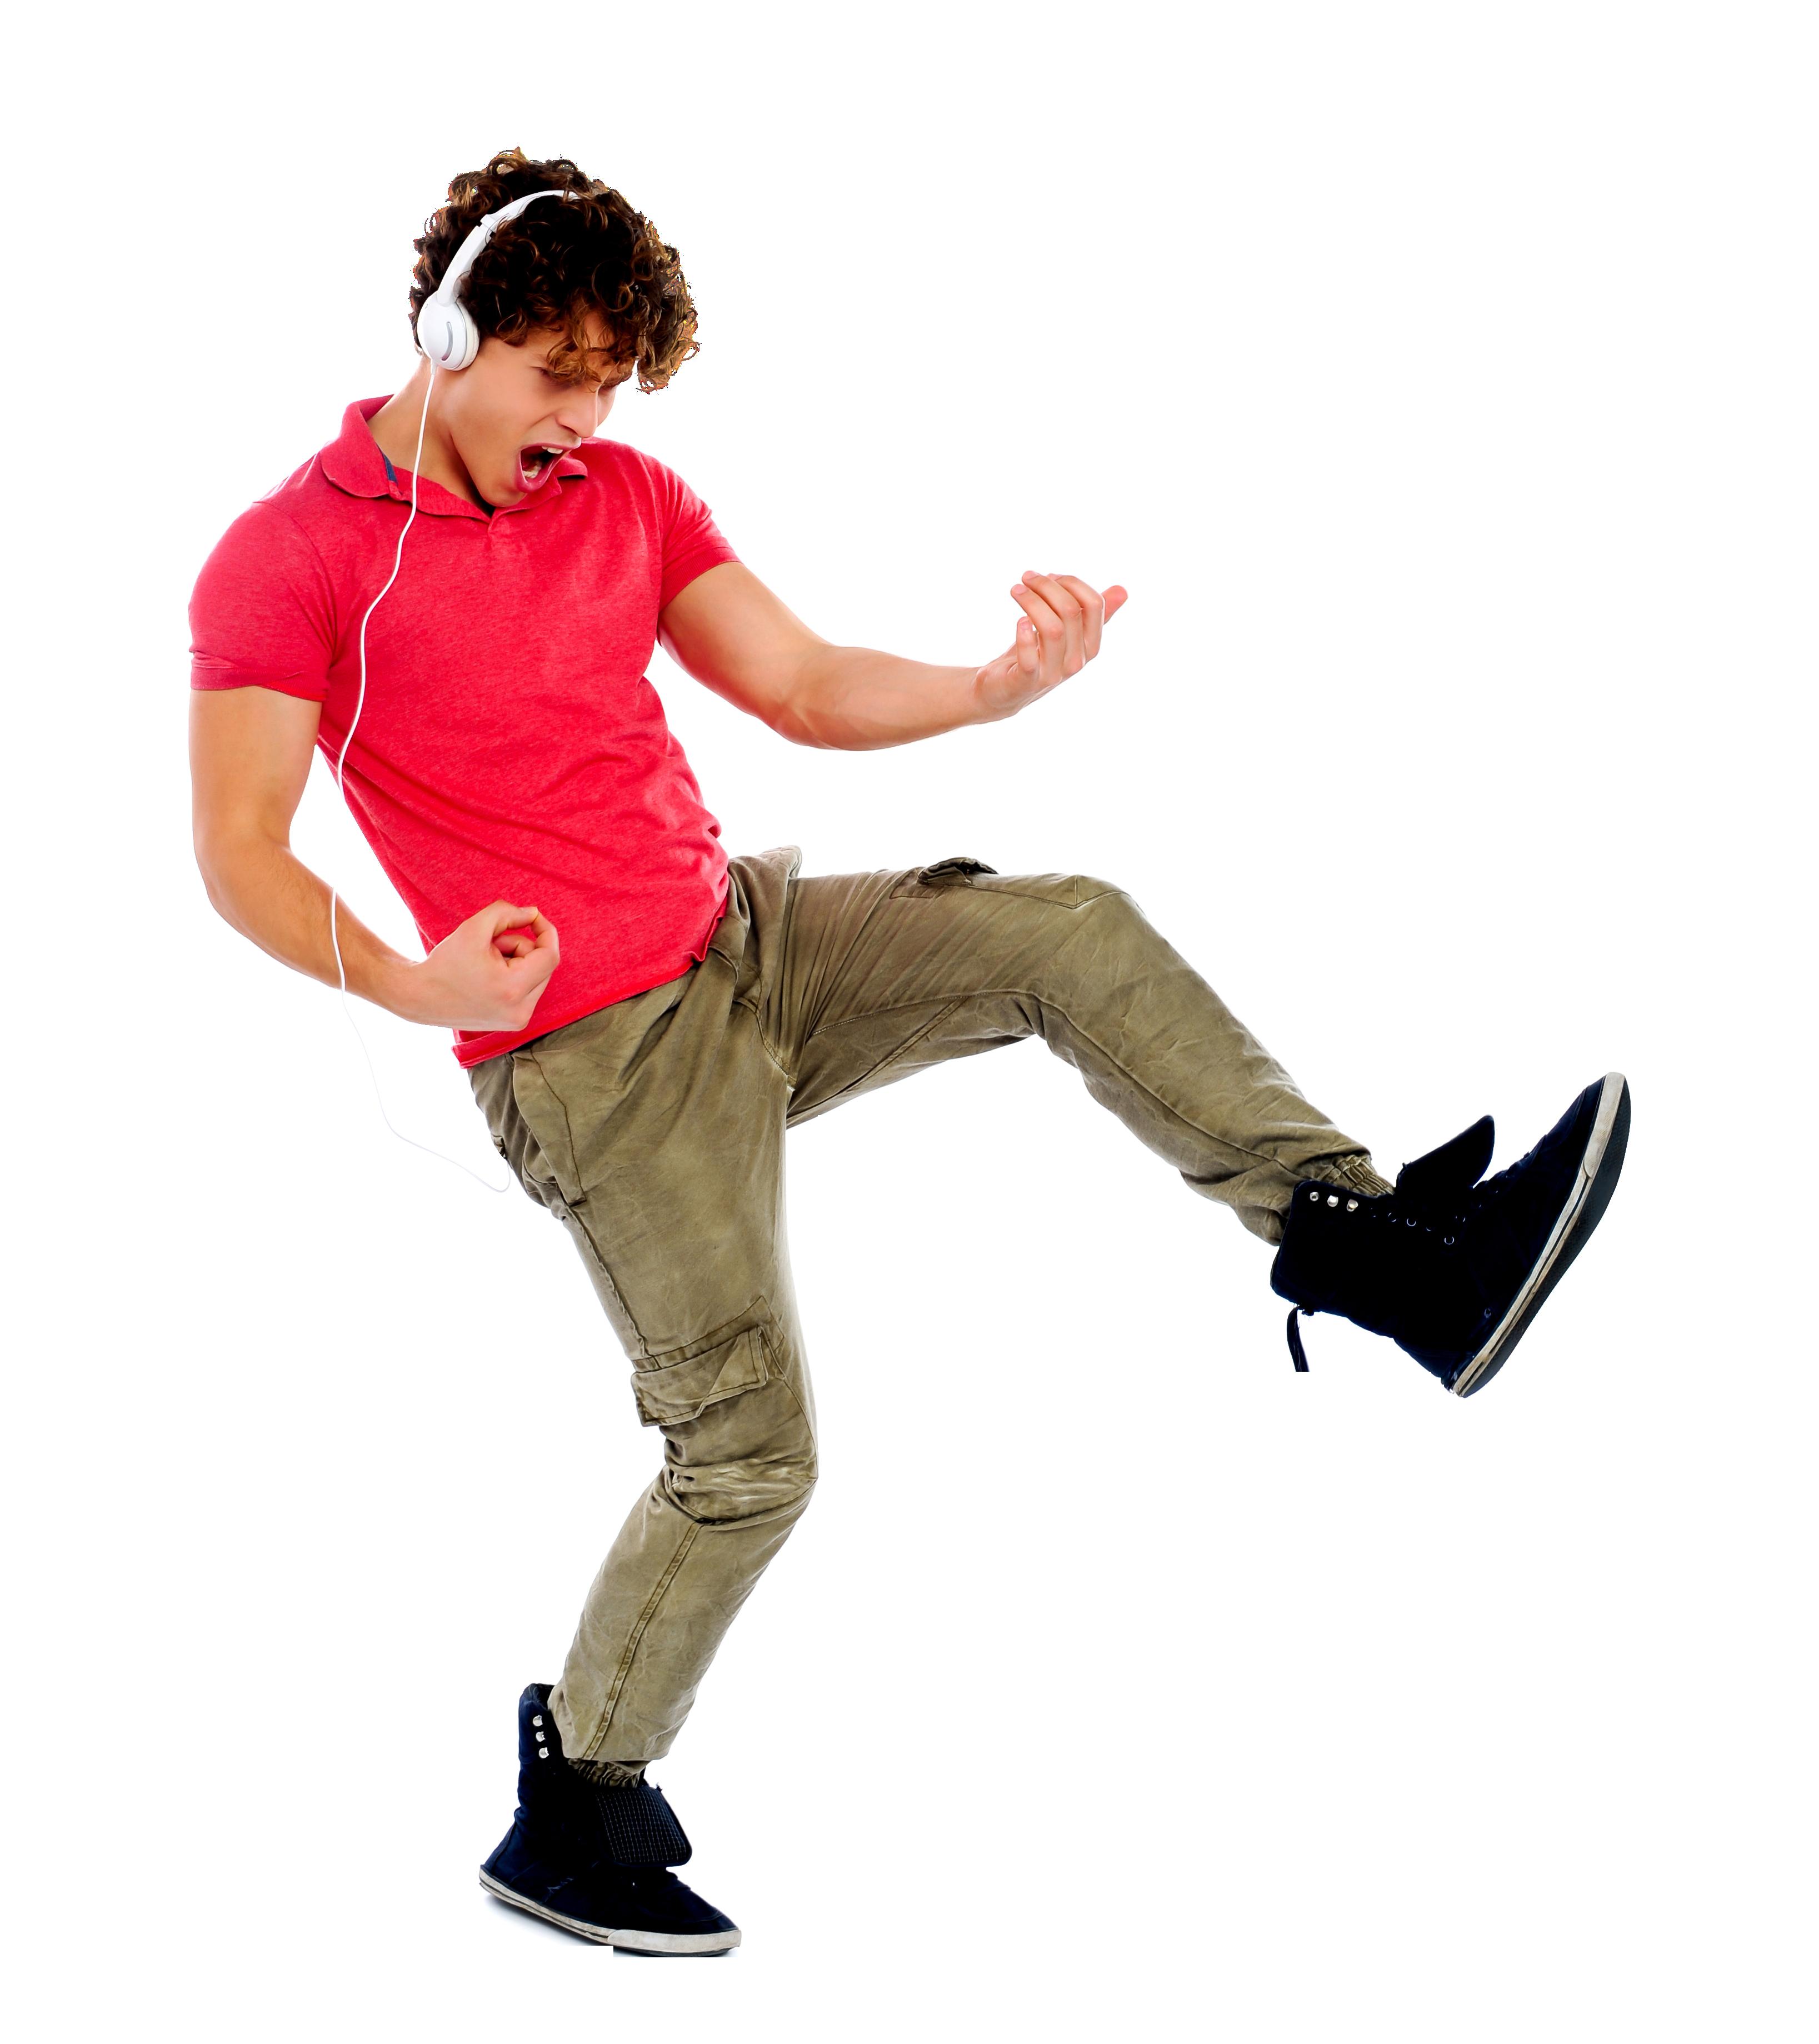 Dancer clipart high kick. Dance png image purepng